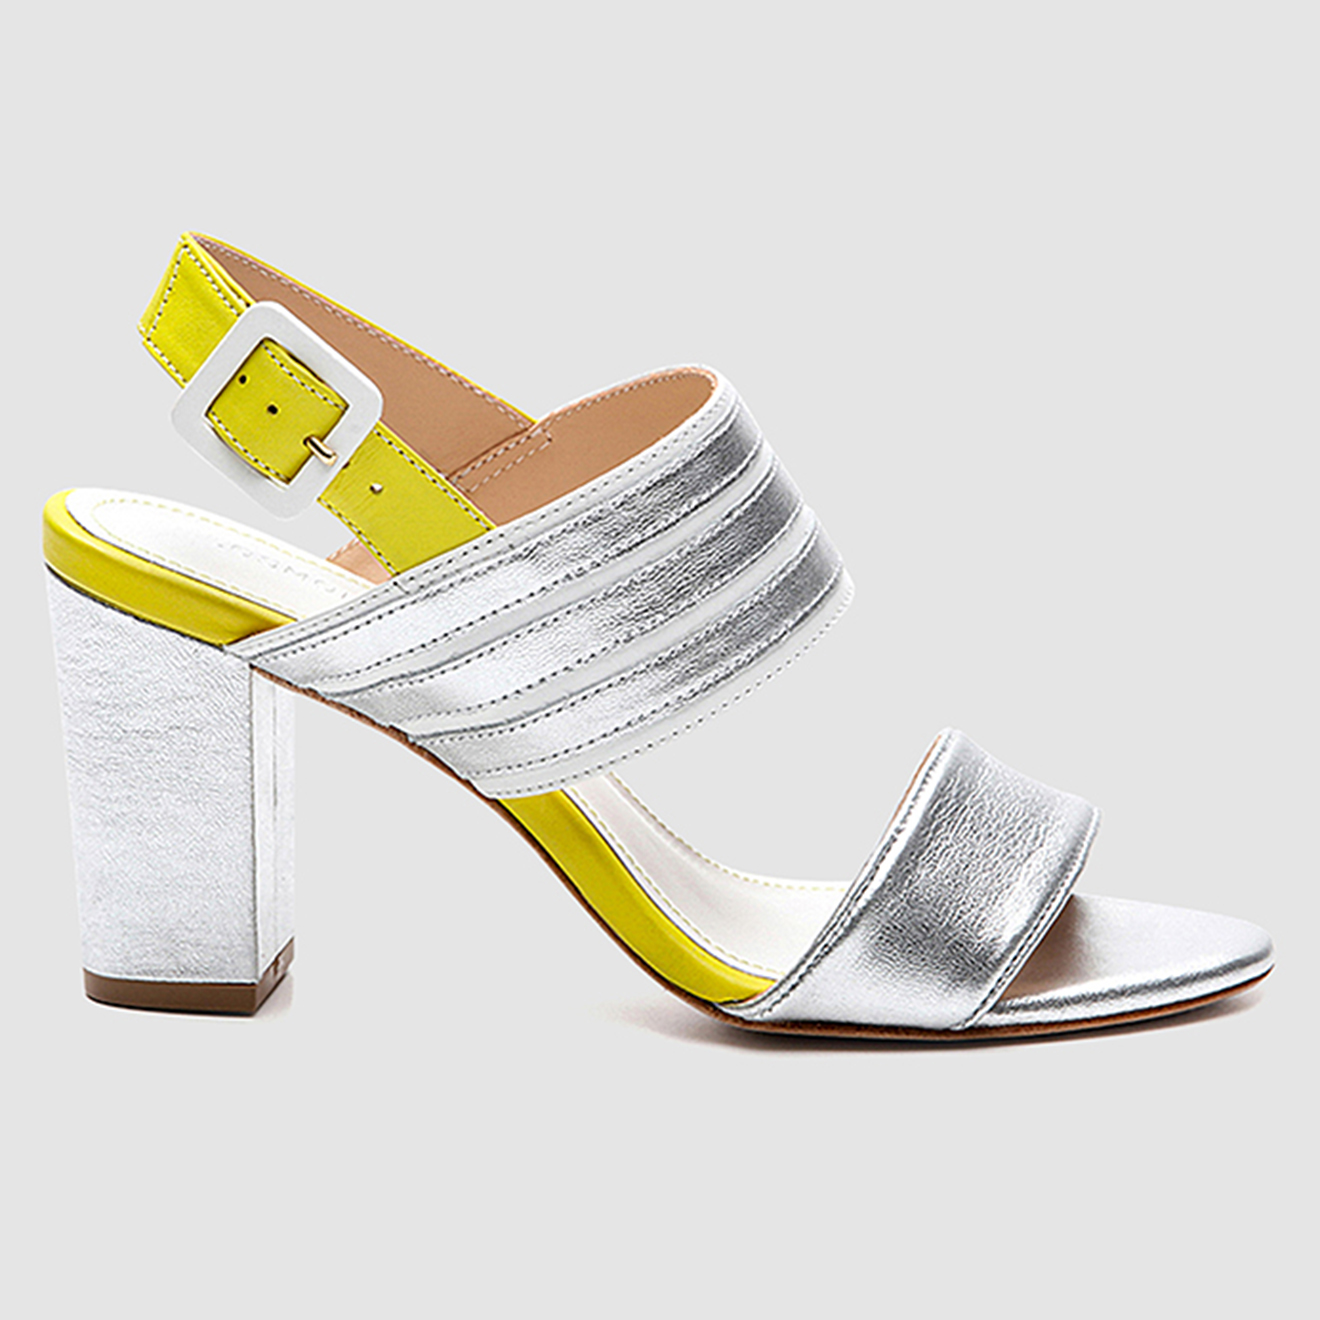 Sandales en Cuir Kaboom - Talon 7 cm - Cosmoparis - Modalova